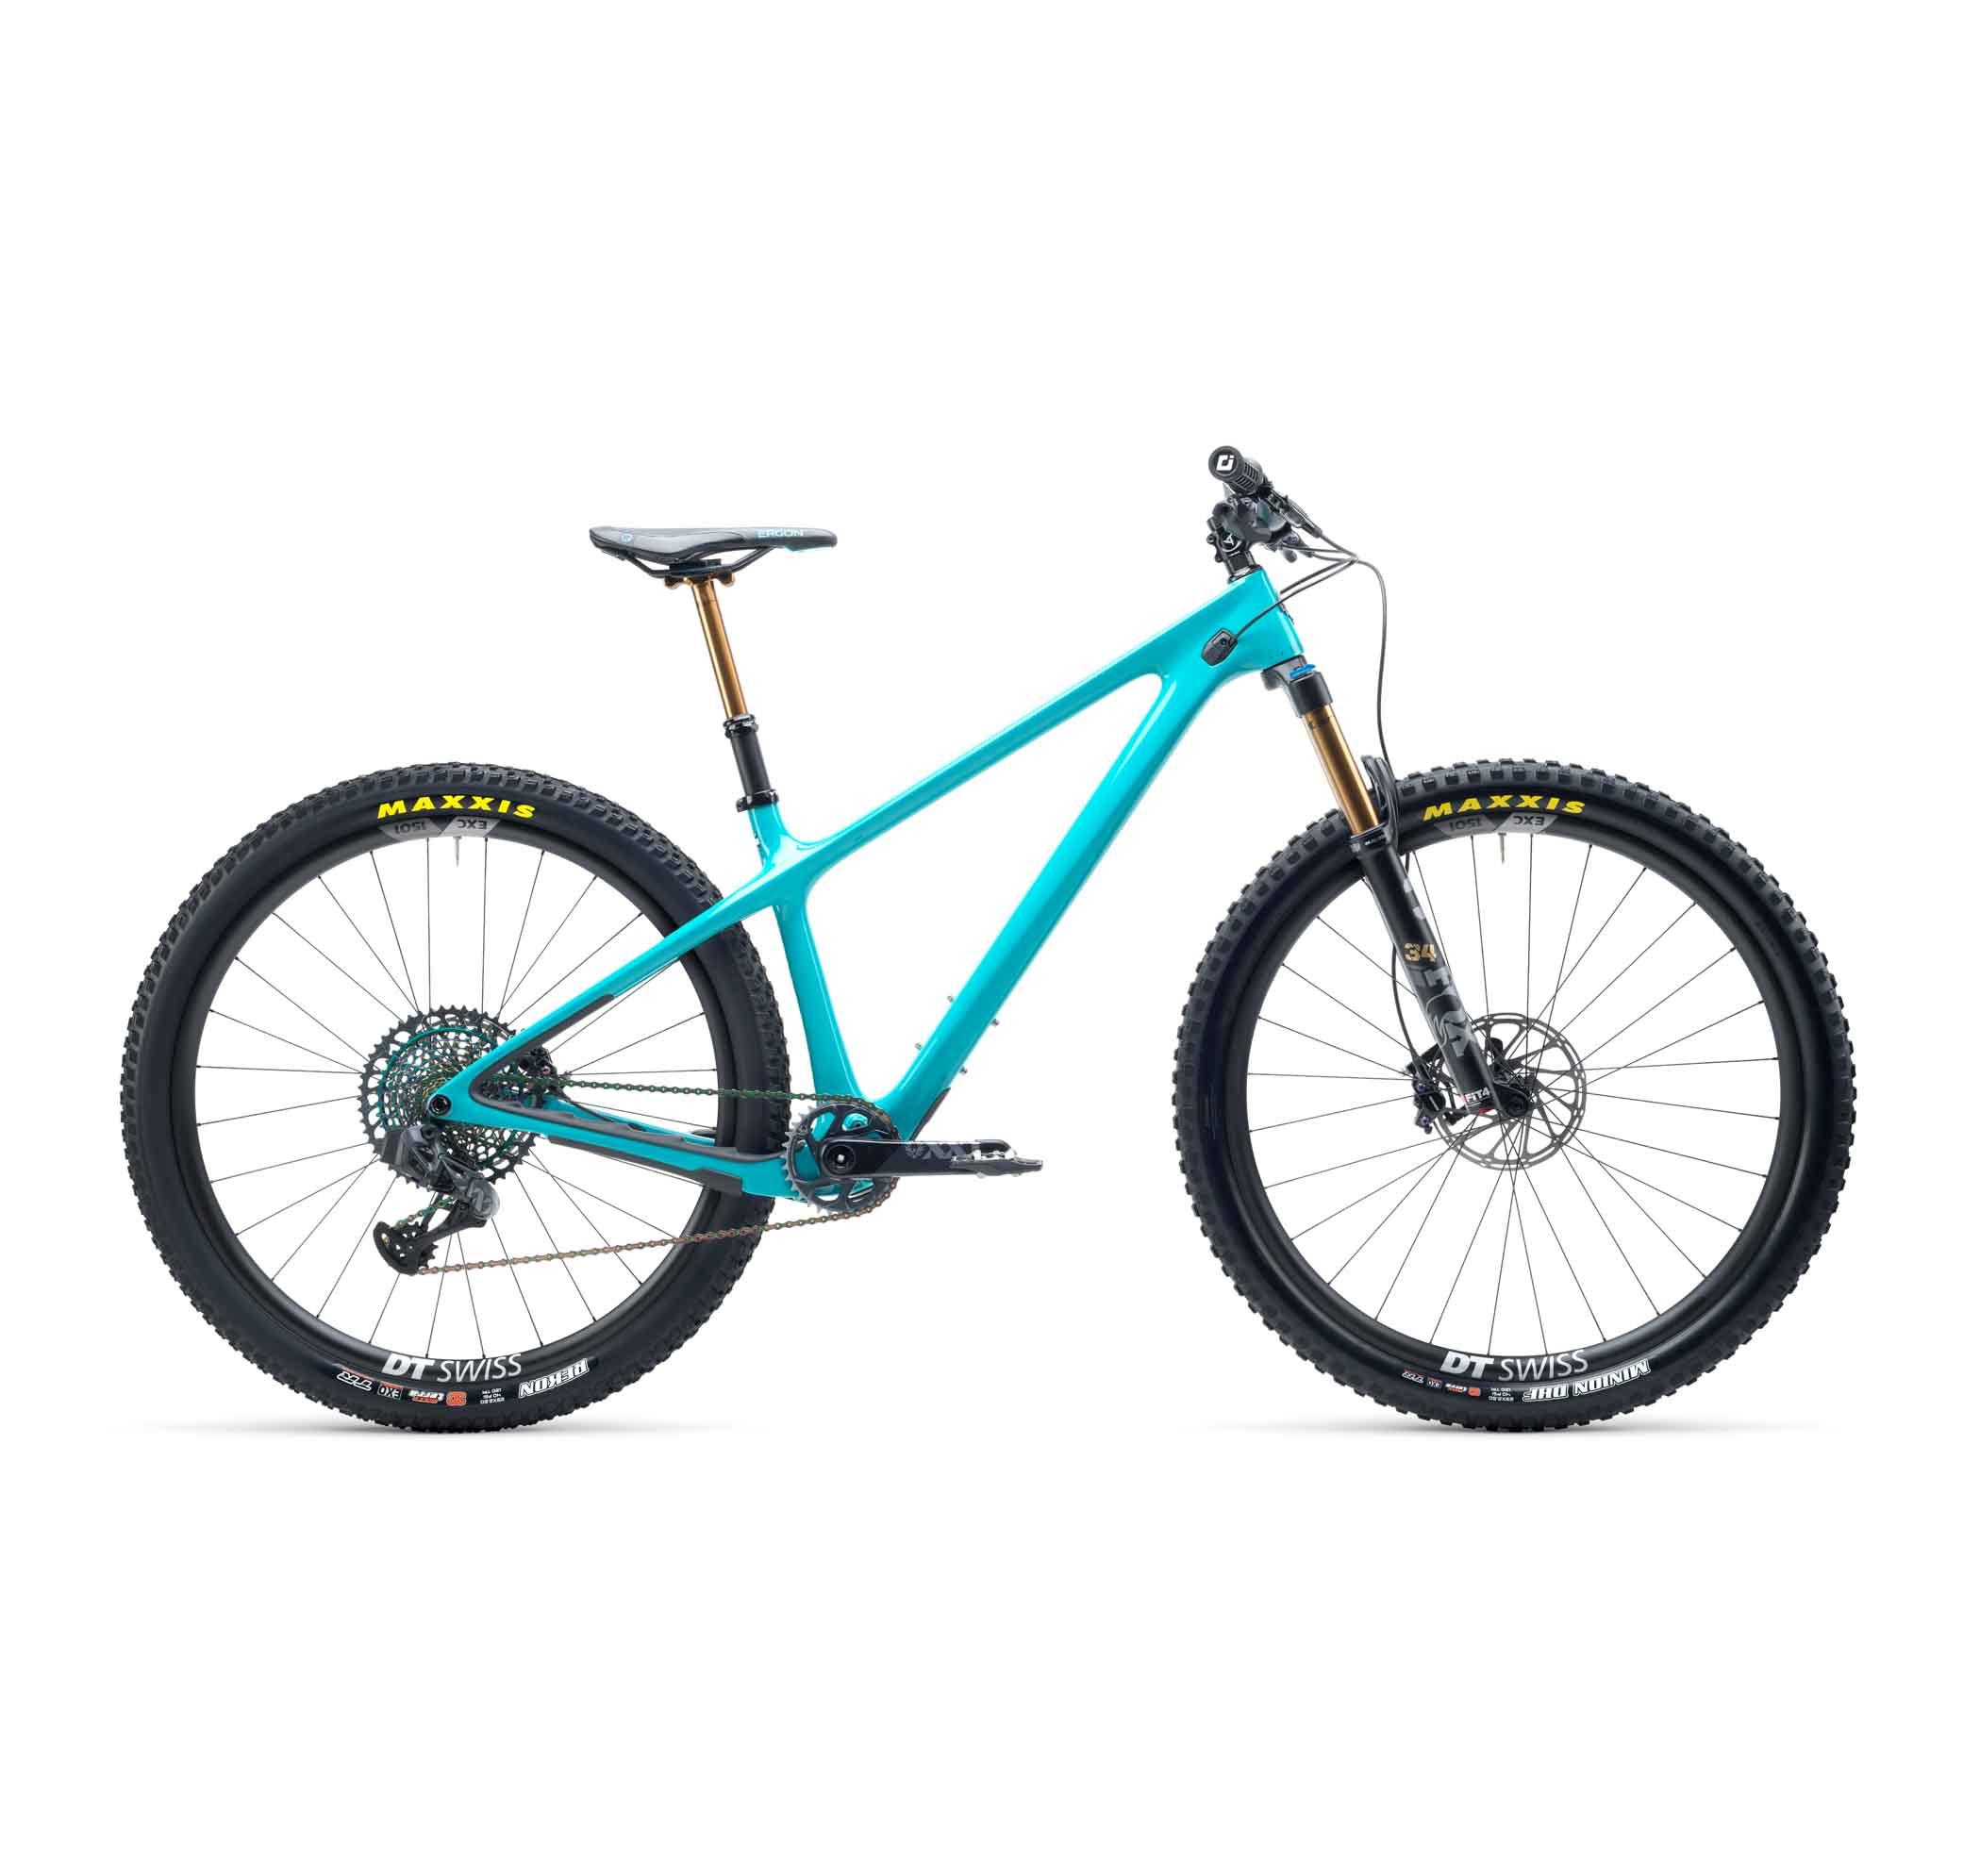 Yeti_Cycles_Rodeo_Bike_ARC_Turquoise